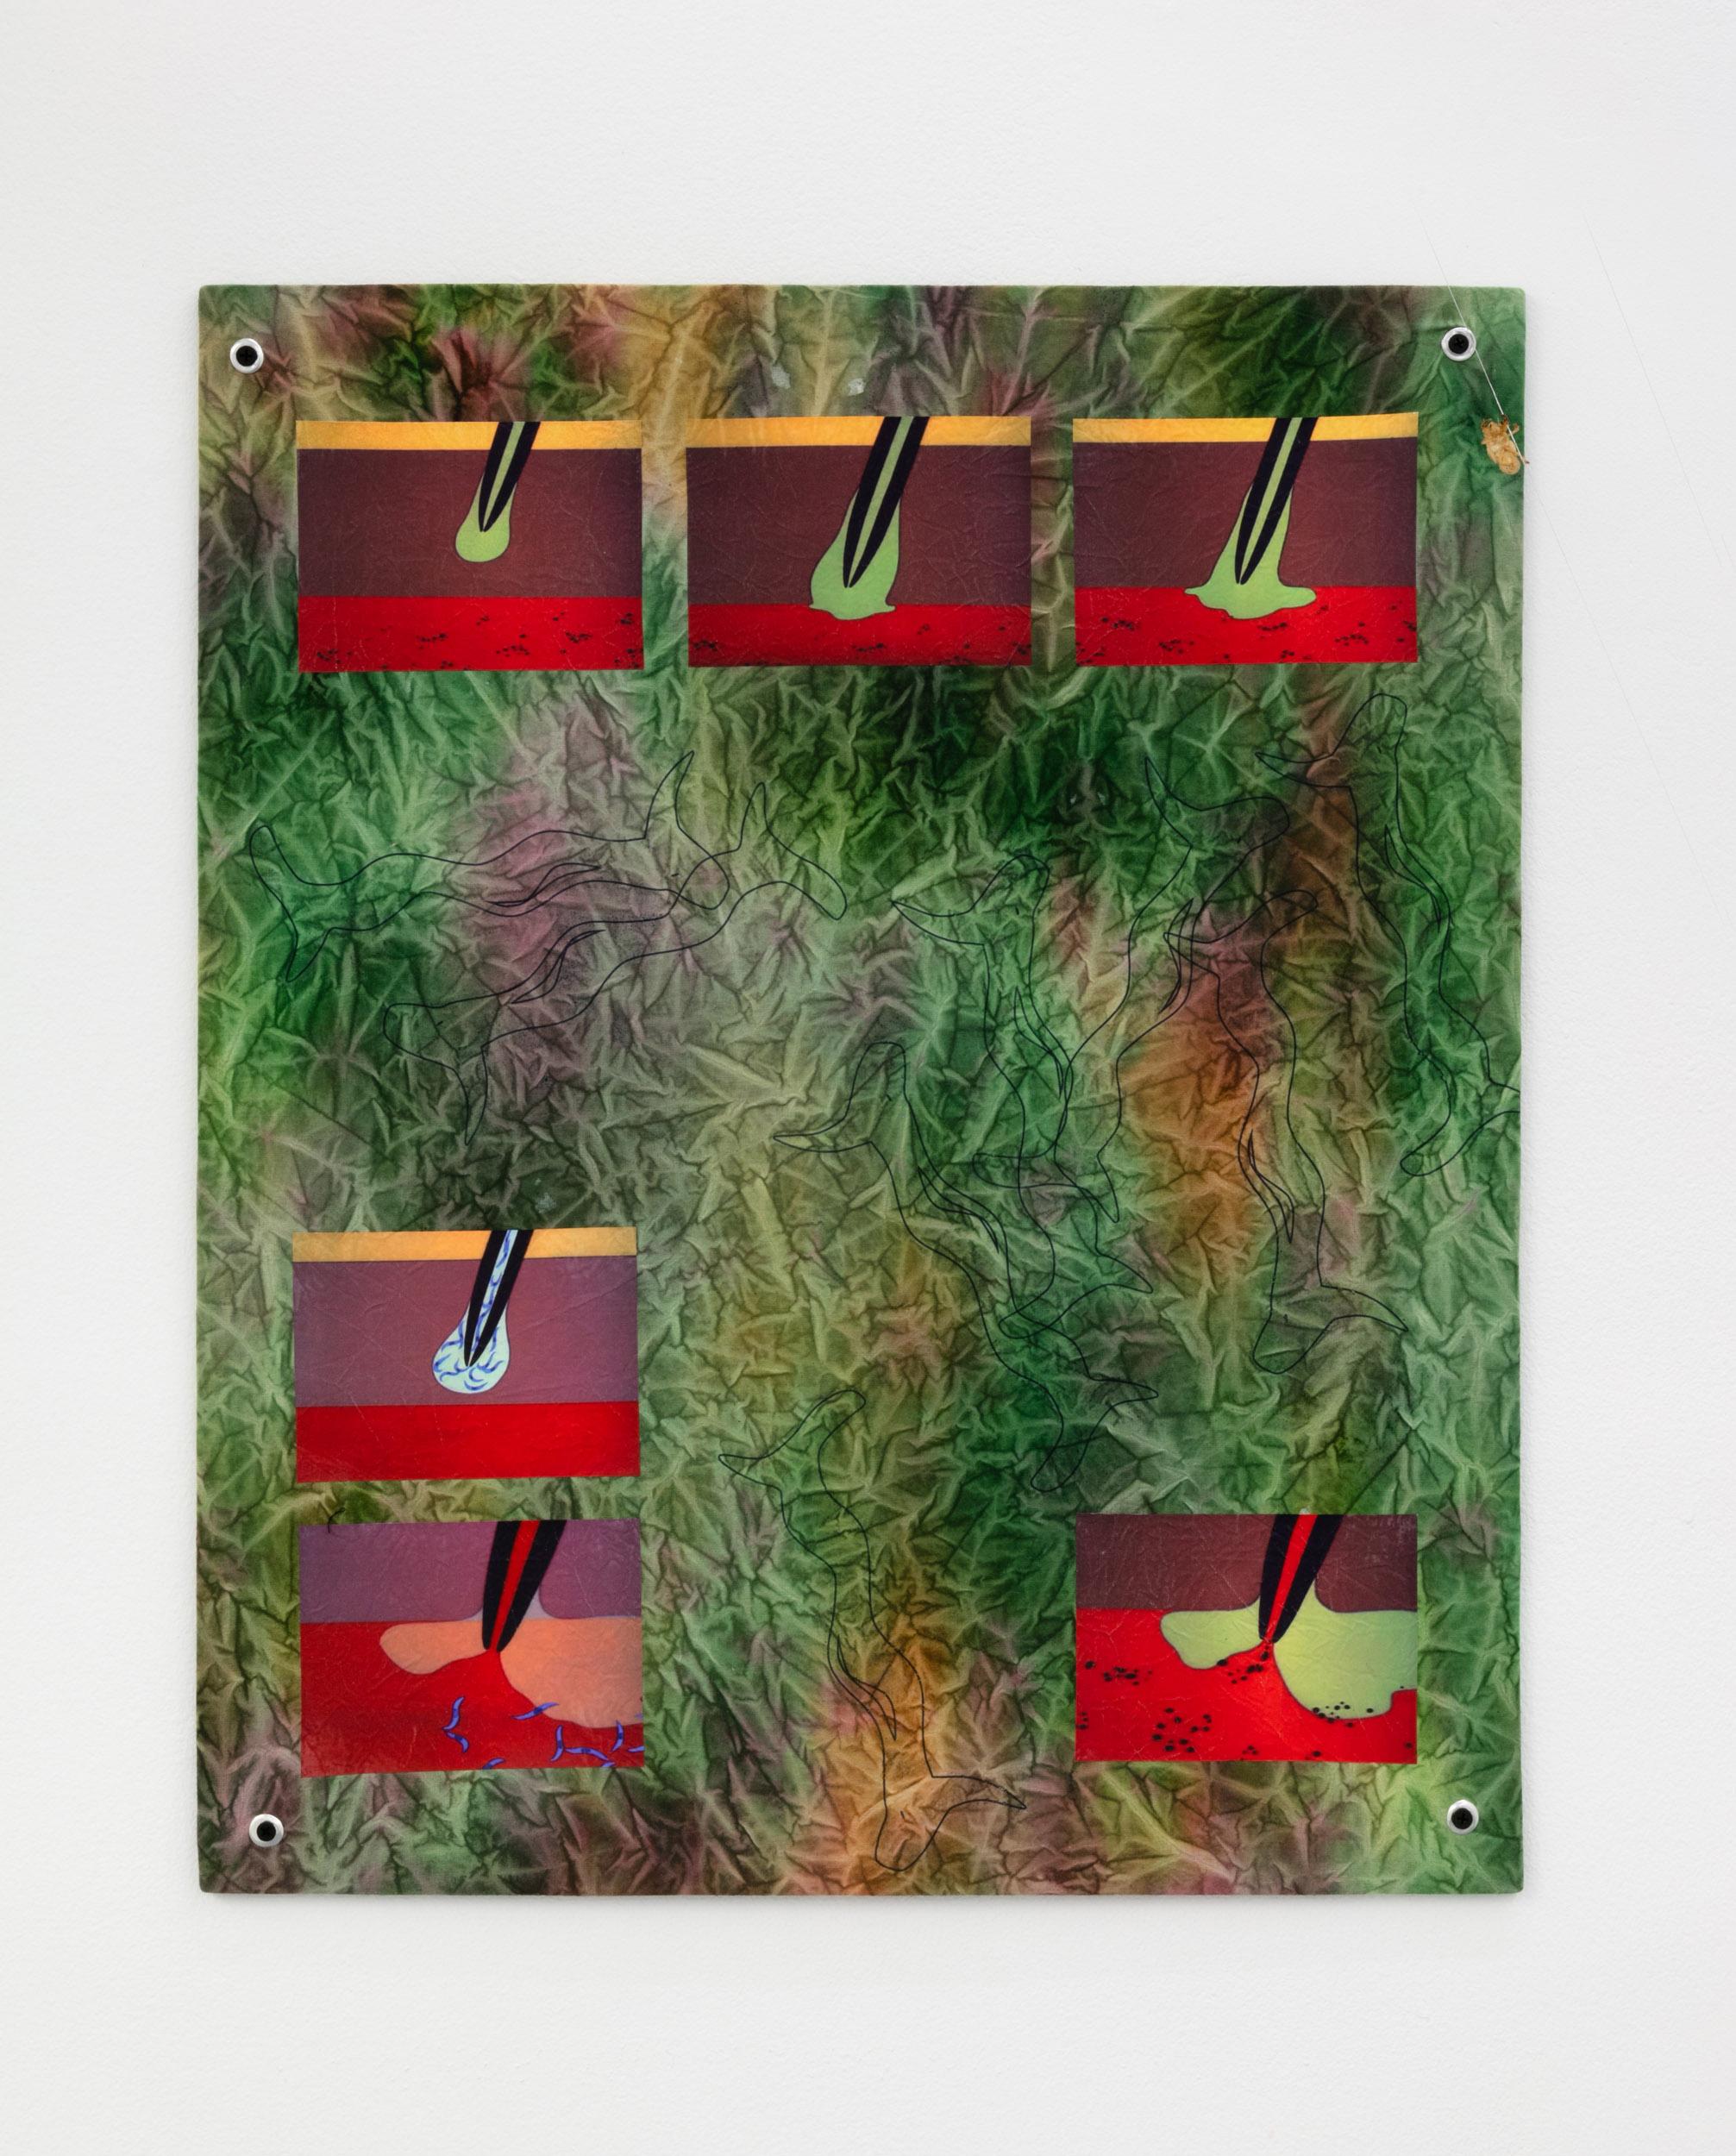 Elif Saydam,  I, pathogen , 2019, Inkjet transfer, aluminium grommets on dyed canvas, mounted on poplar board